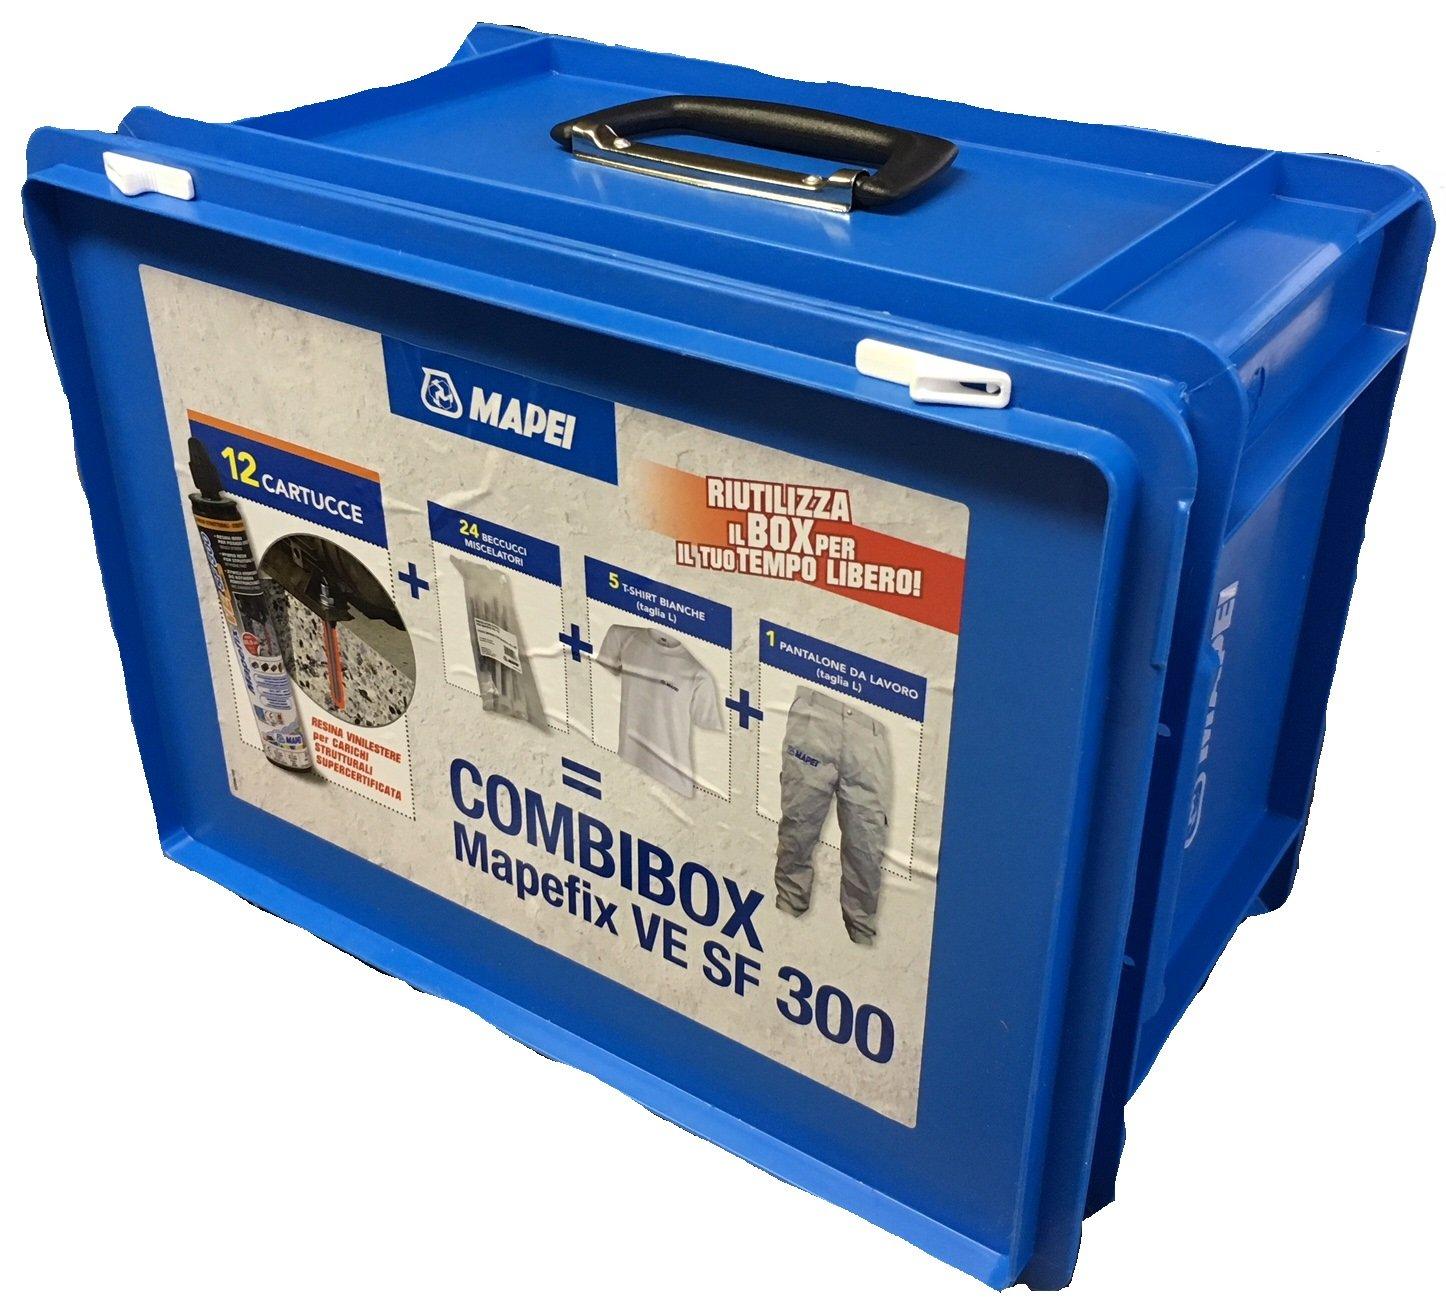 Combibox 2